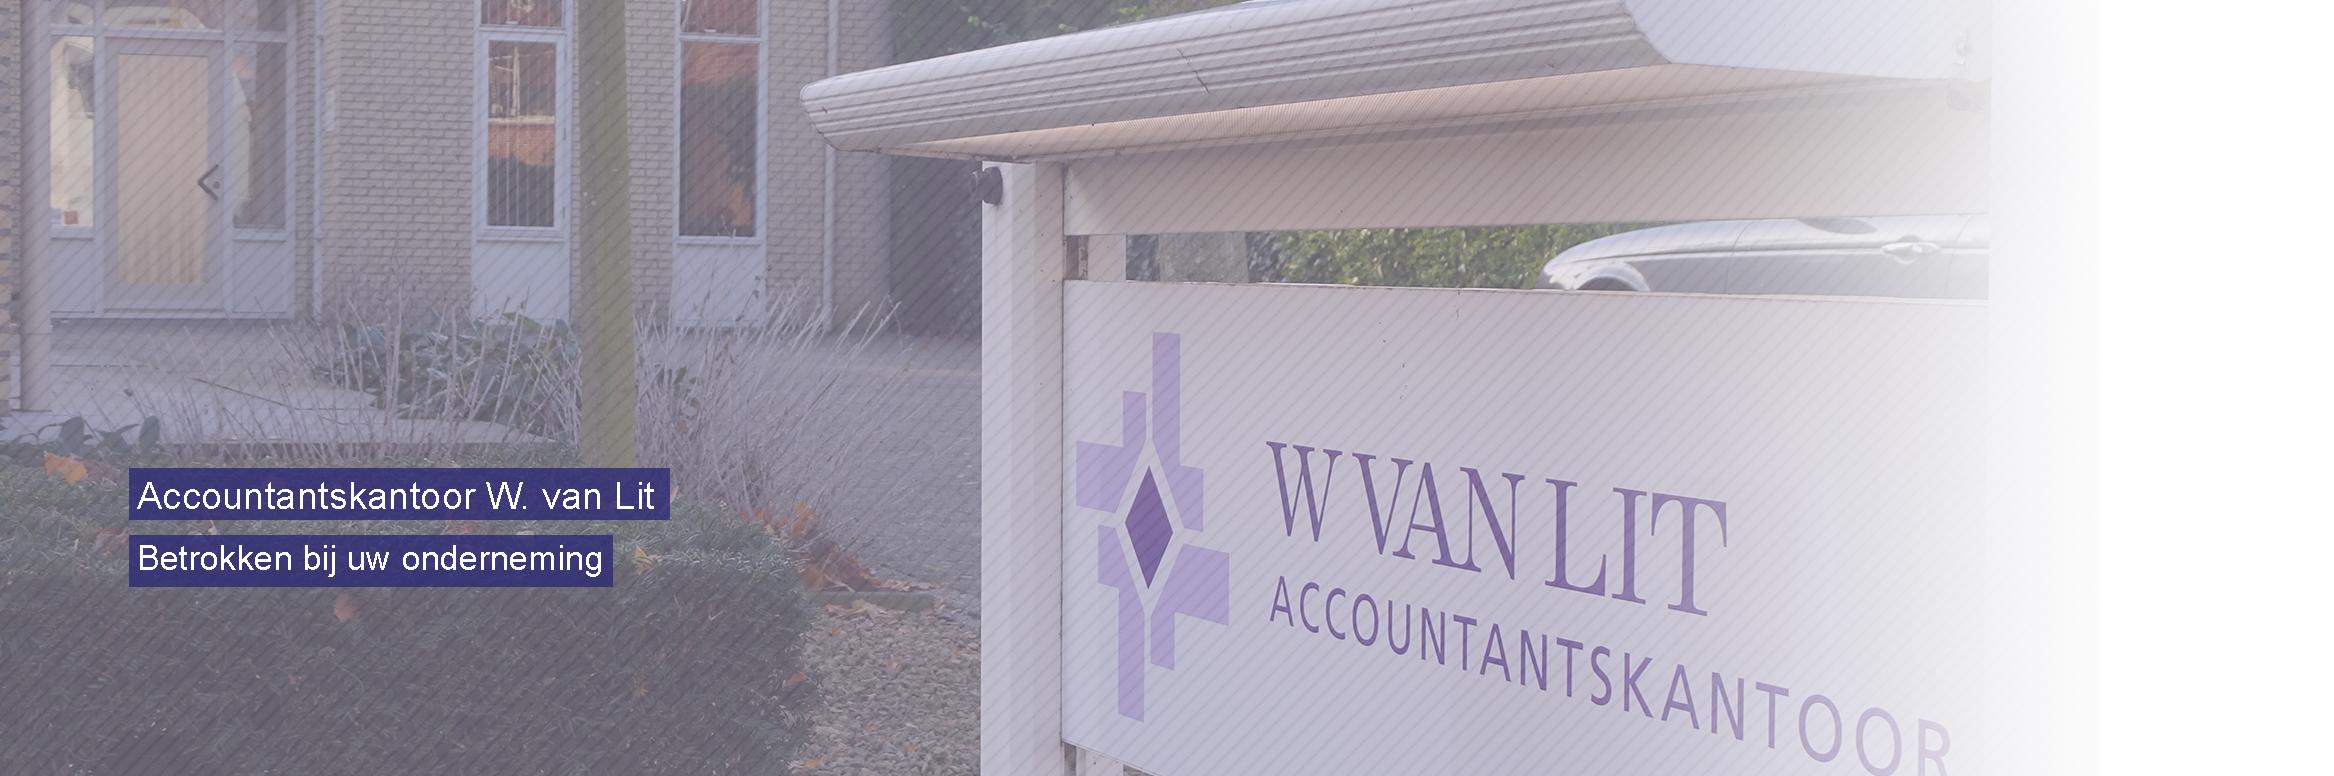 Accountantskantoor W. van Lit in Goes